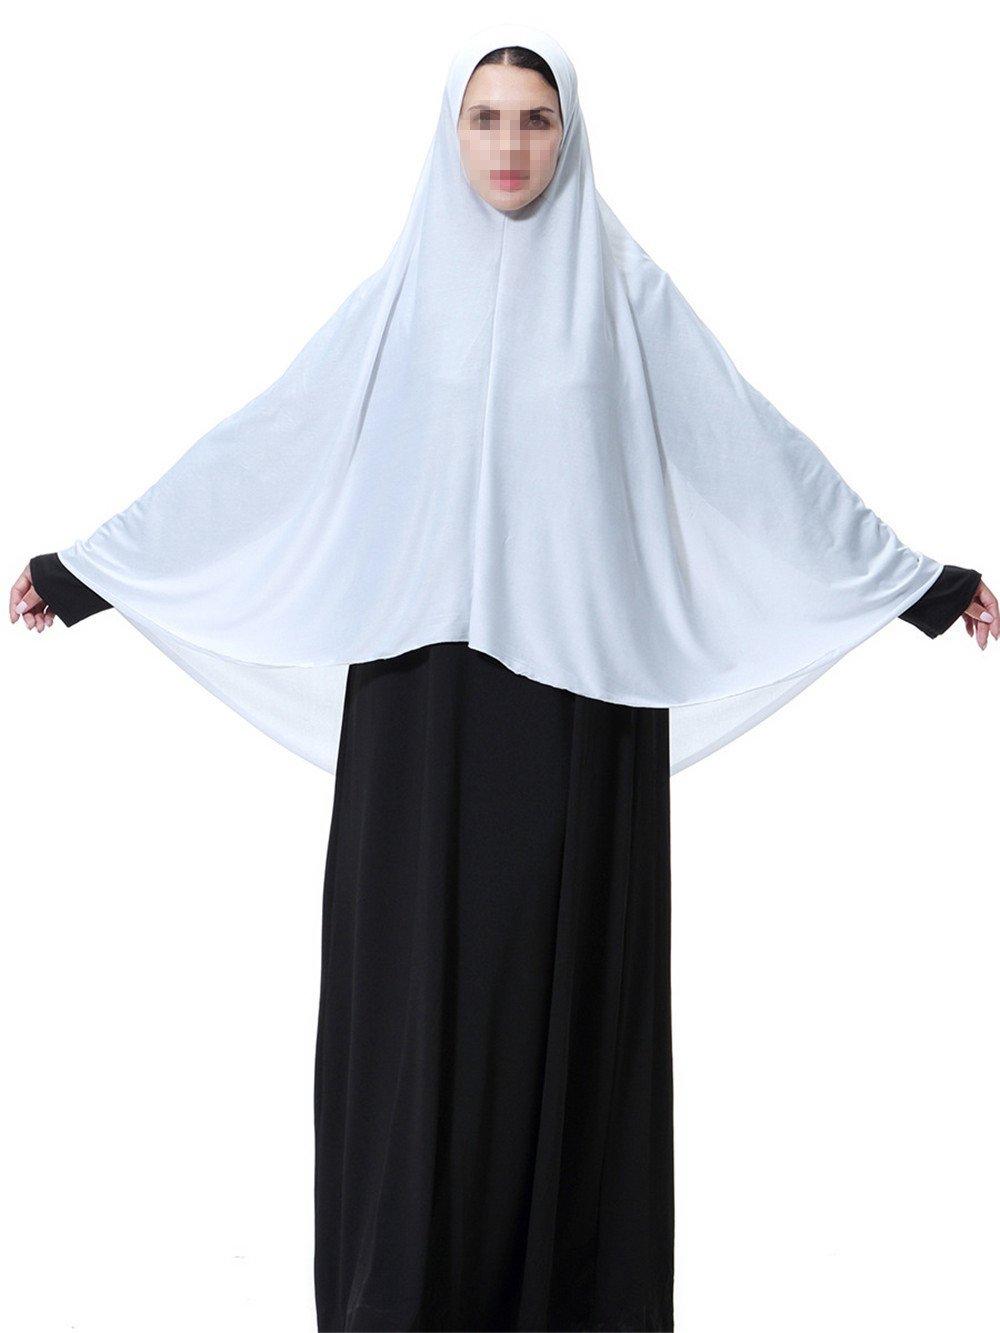 Swallowuk Hijab Maxi Schal Lange Kopftuch Damen Muslimische Schals Arabien Islamische Gebet Kleid Abdeckung Kleidung